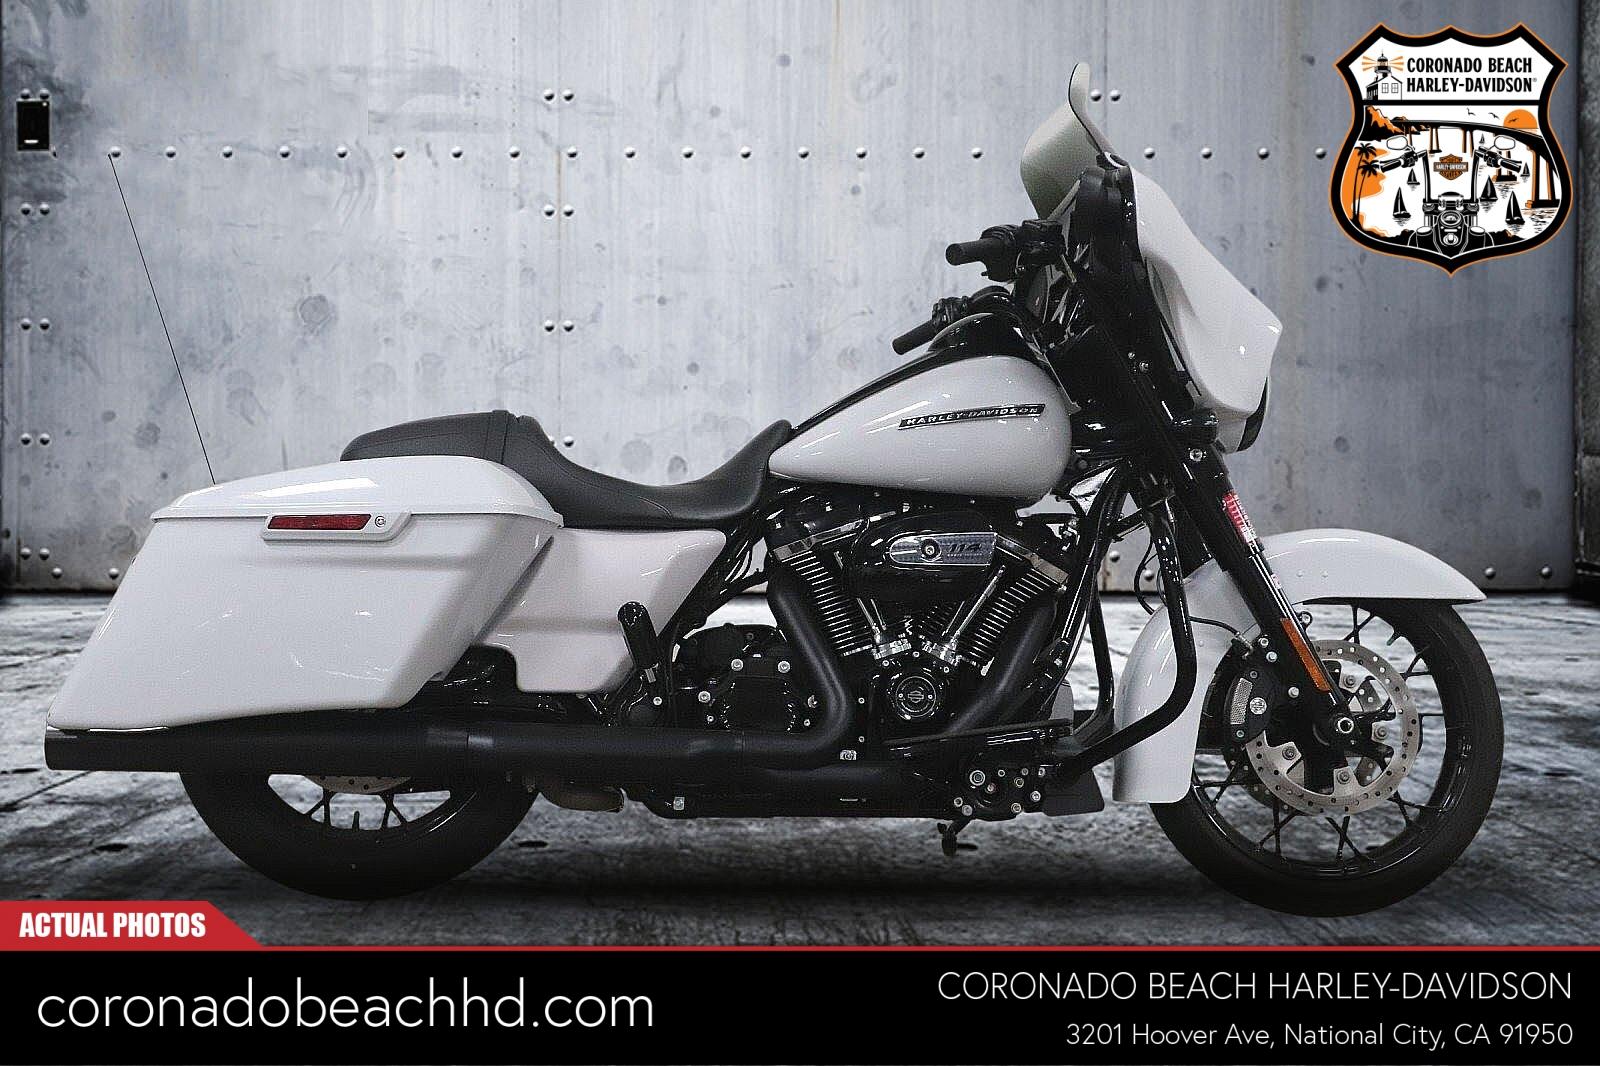 2020 Harley-Davidson Street Glide Special [72]